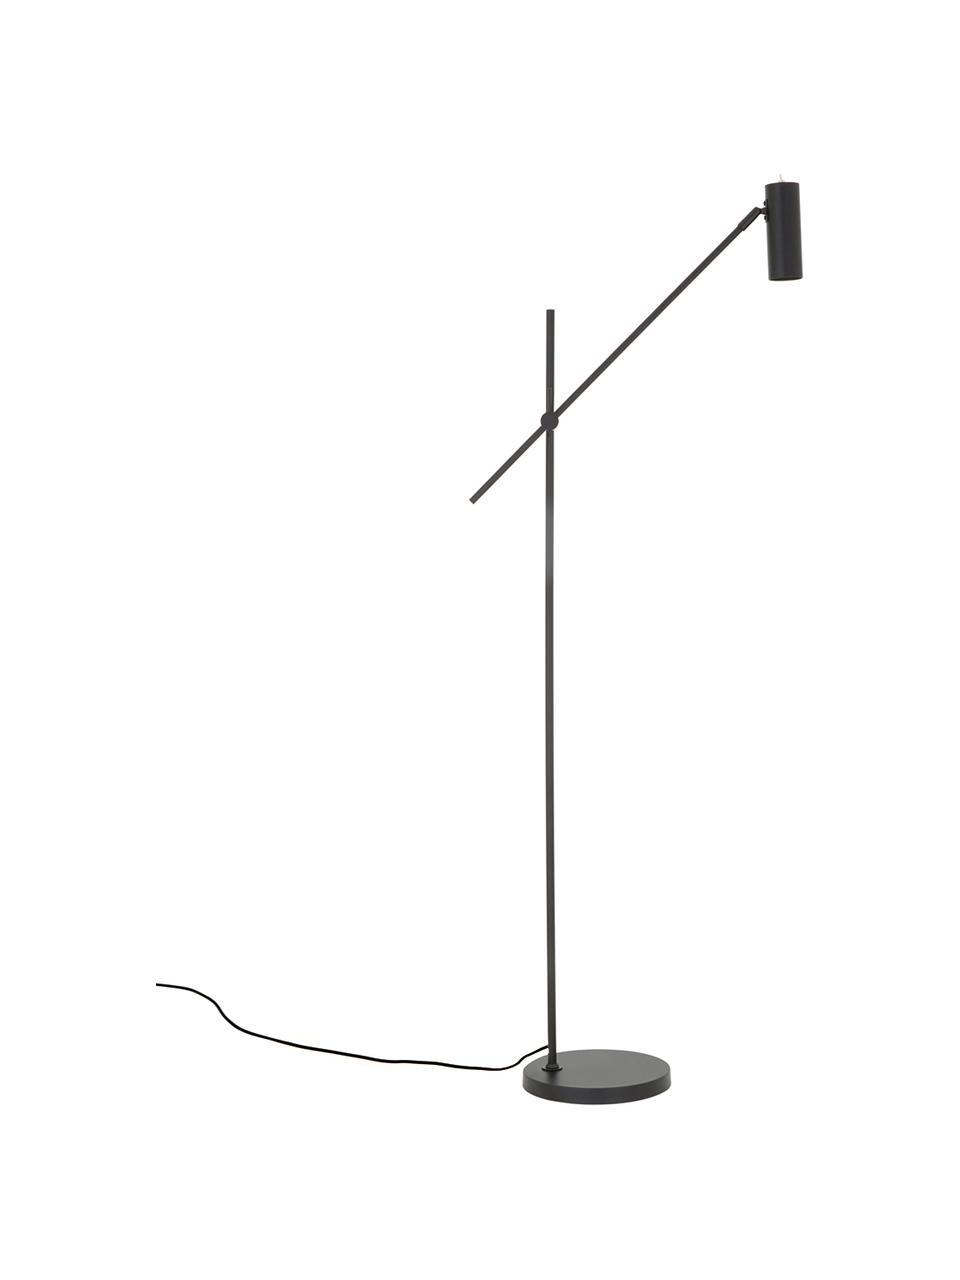 Liseuse moderne en métal Cassandra, Abat-jour: noir, mat Pied de lampe: noir, mat Câble: noir